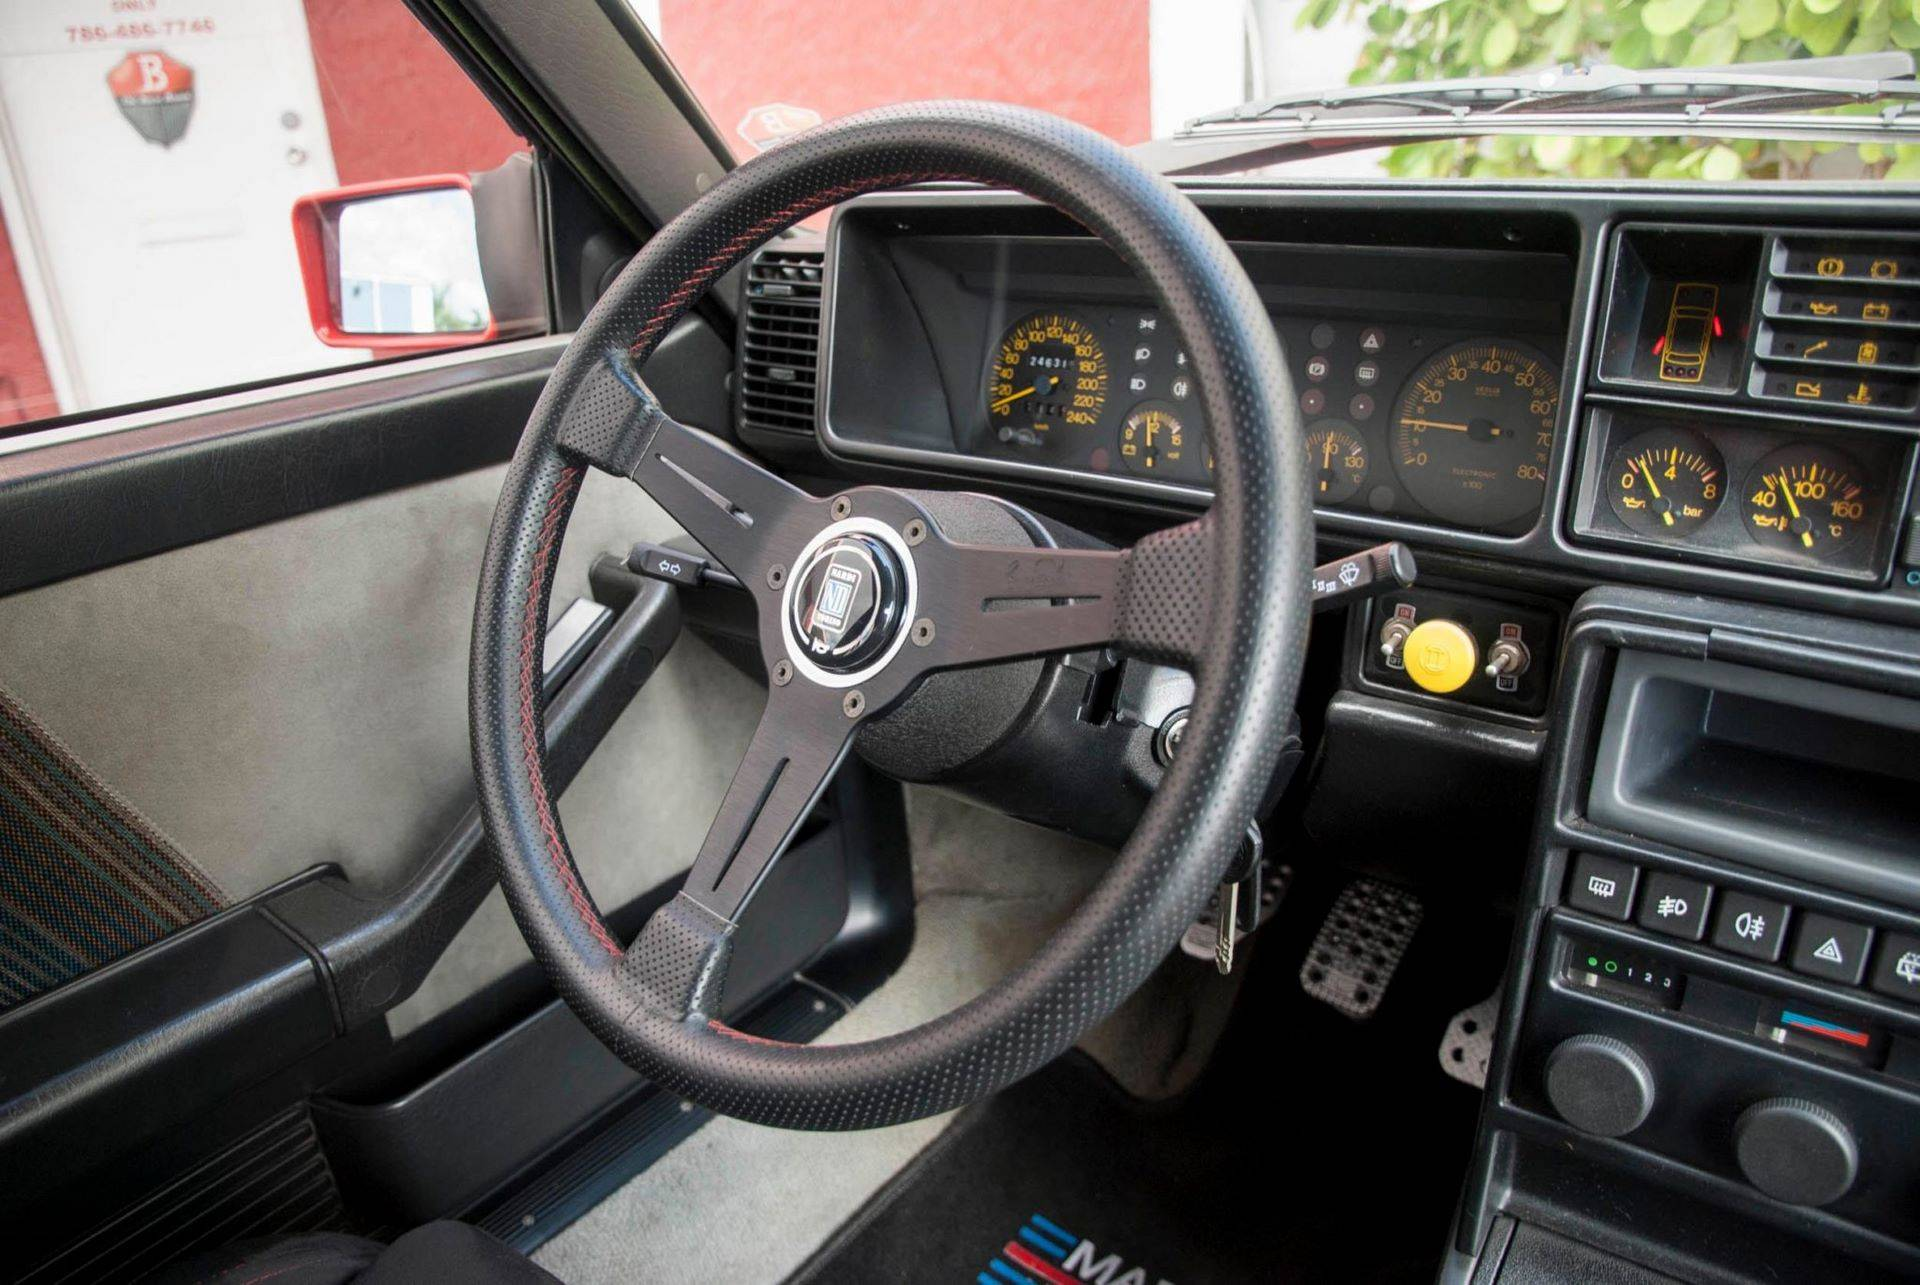 Lancia-Delta-Integrale-8V-1989-80